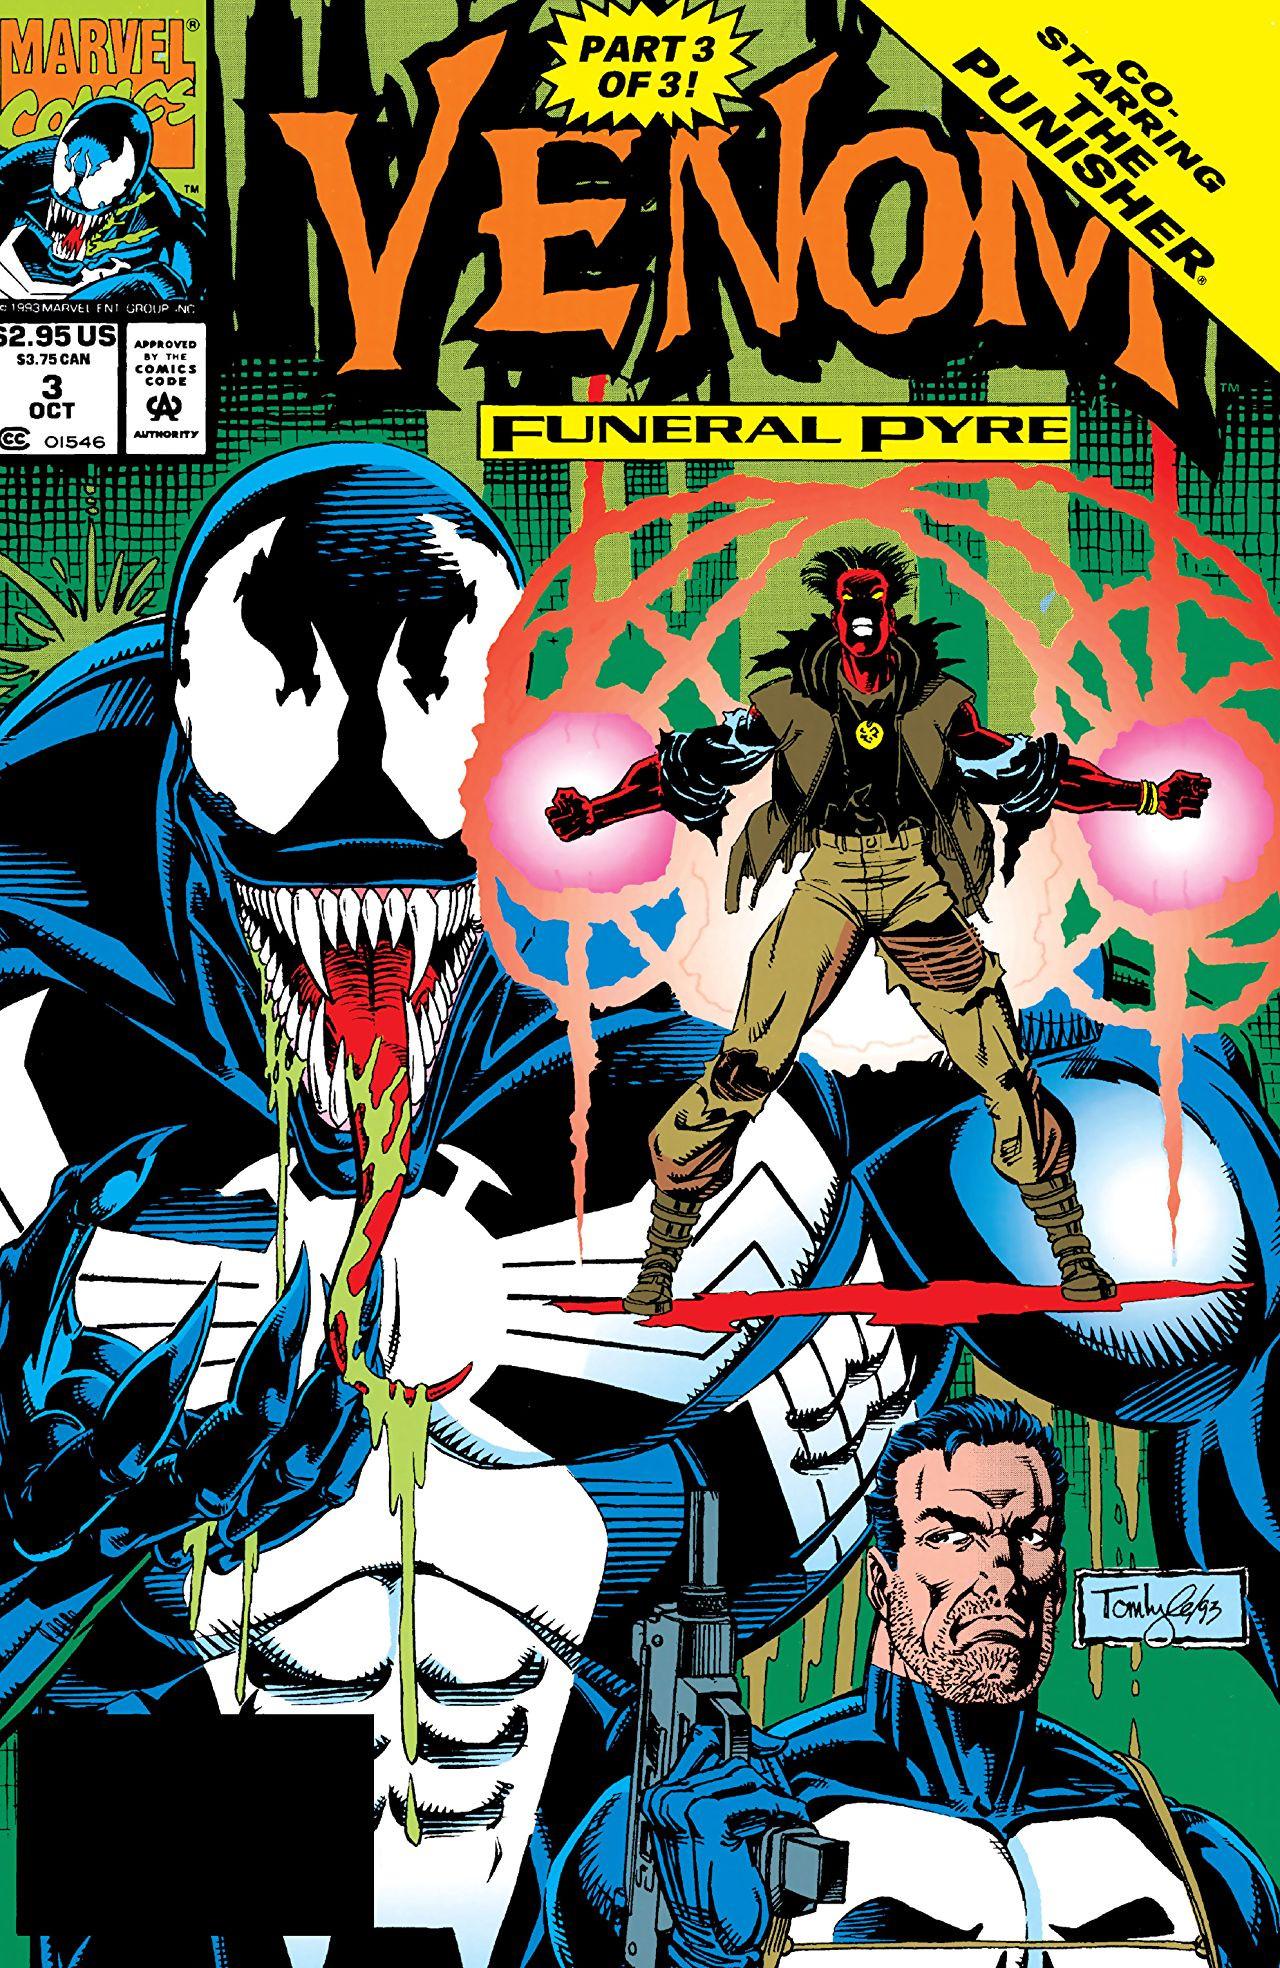 Venom: Funeral Pyre Vol 1 3